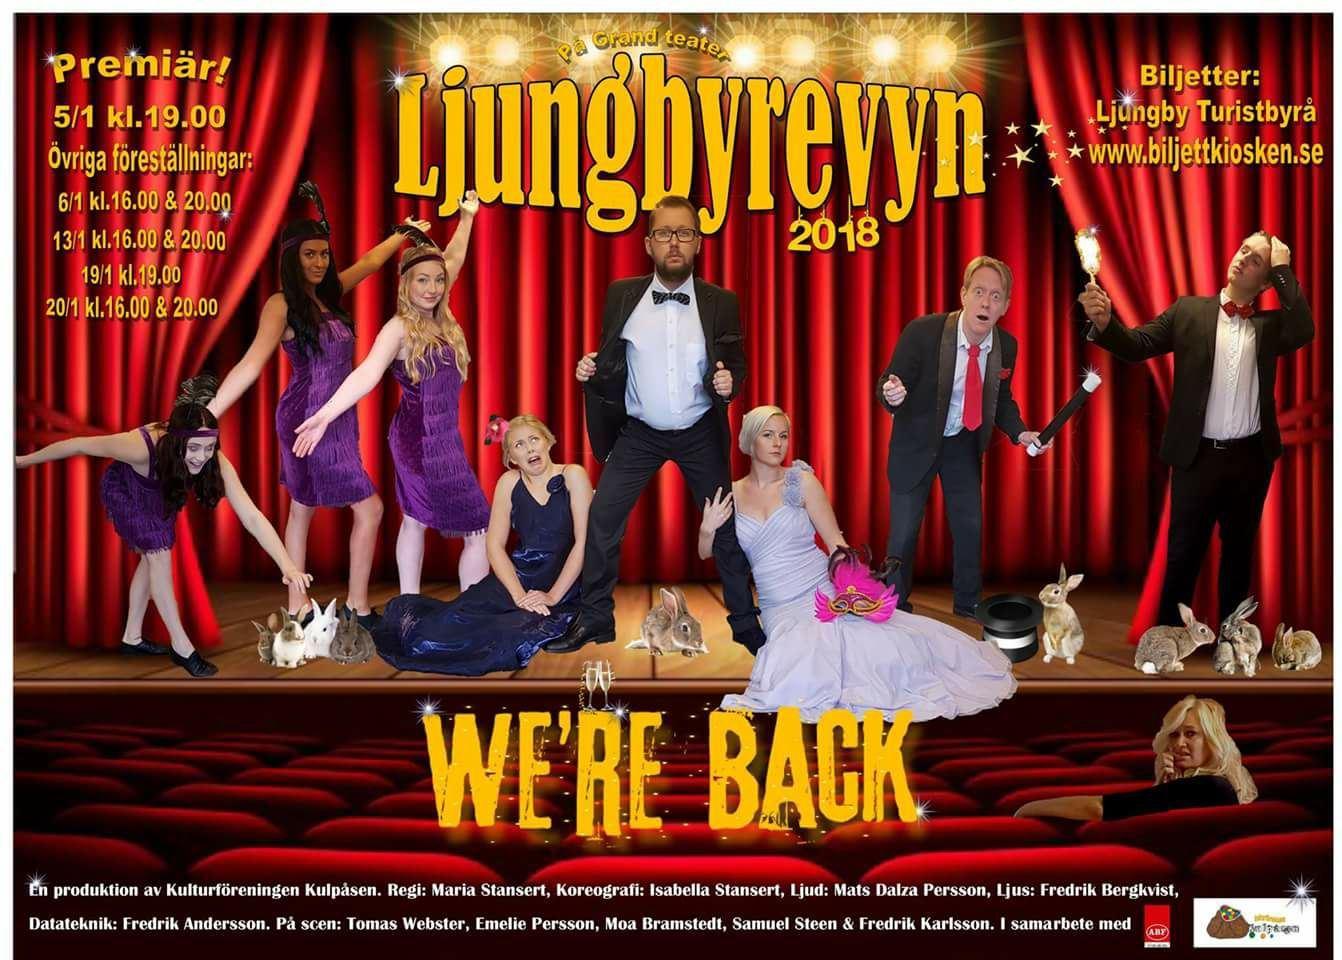 Ljungbyrevyn 2018 - We´re back